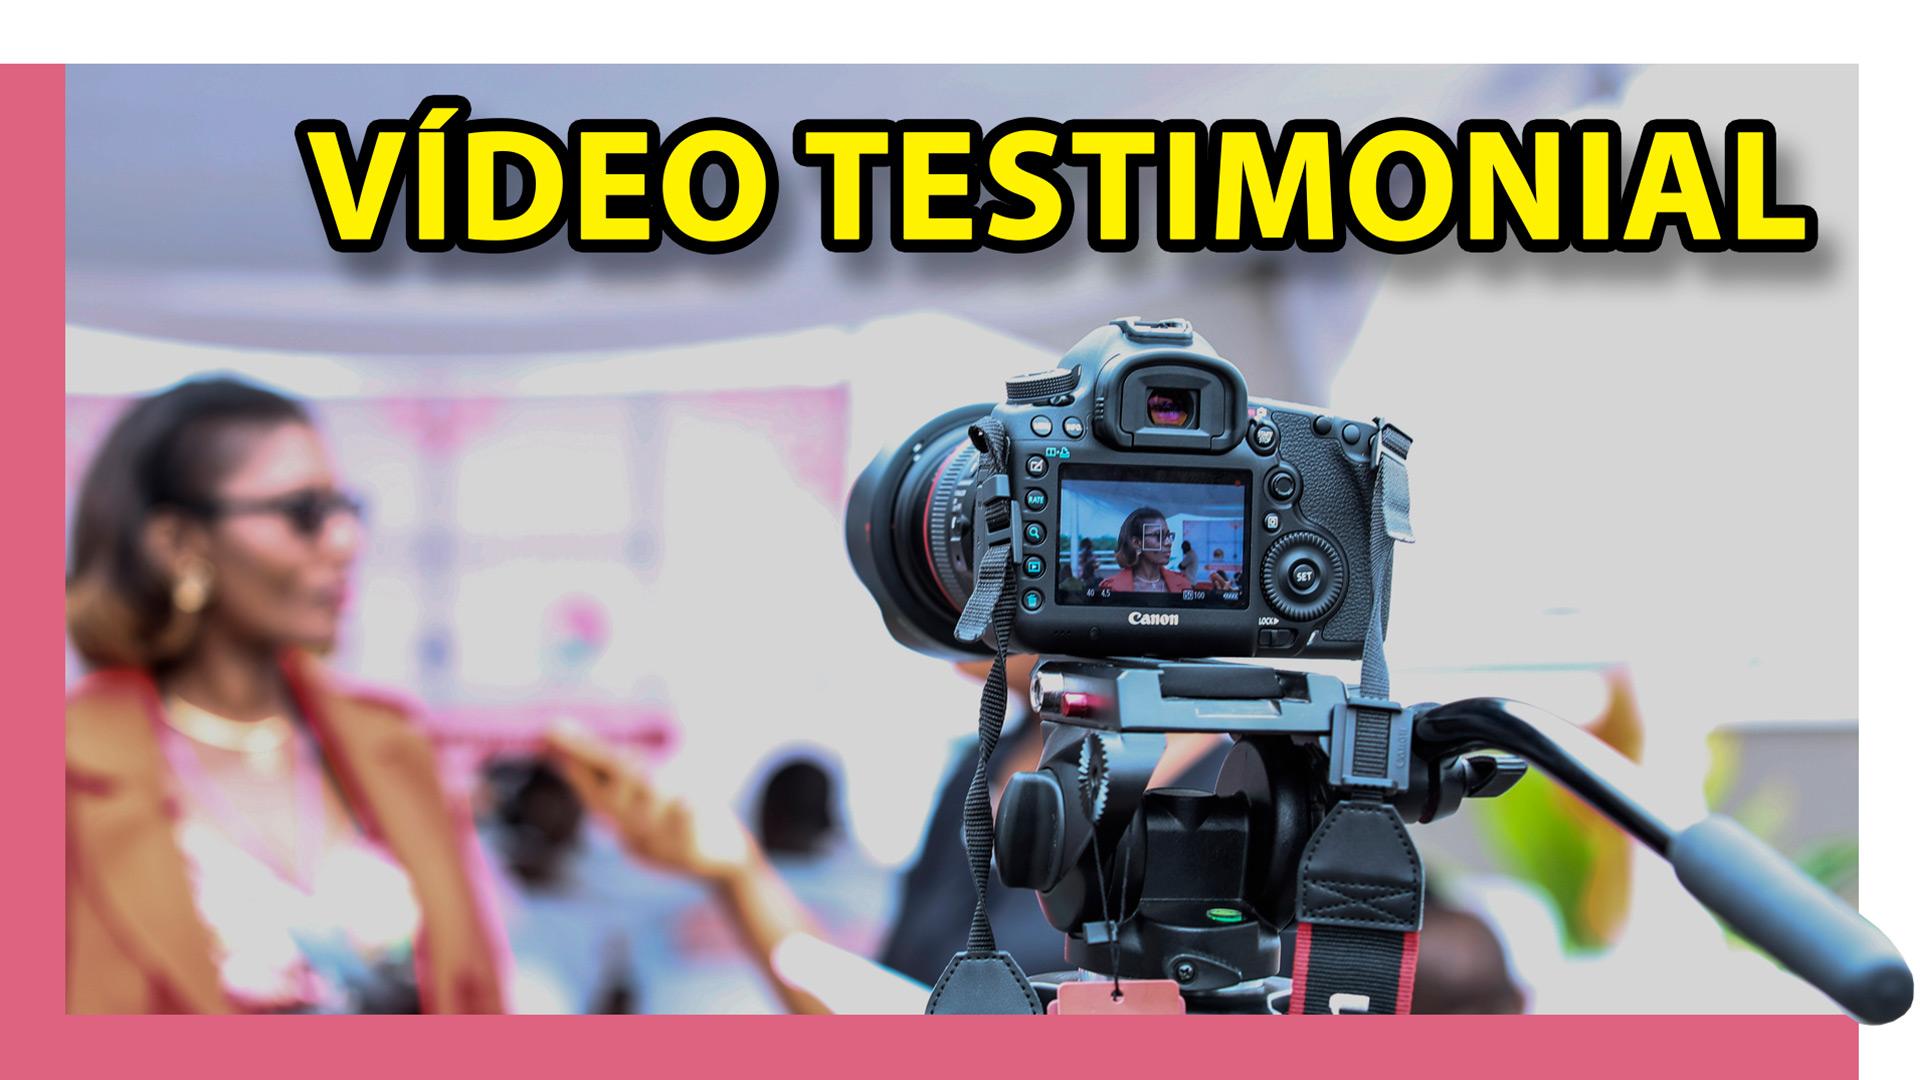 Vídeo testimonial